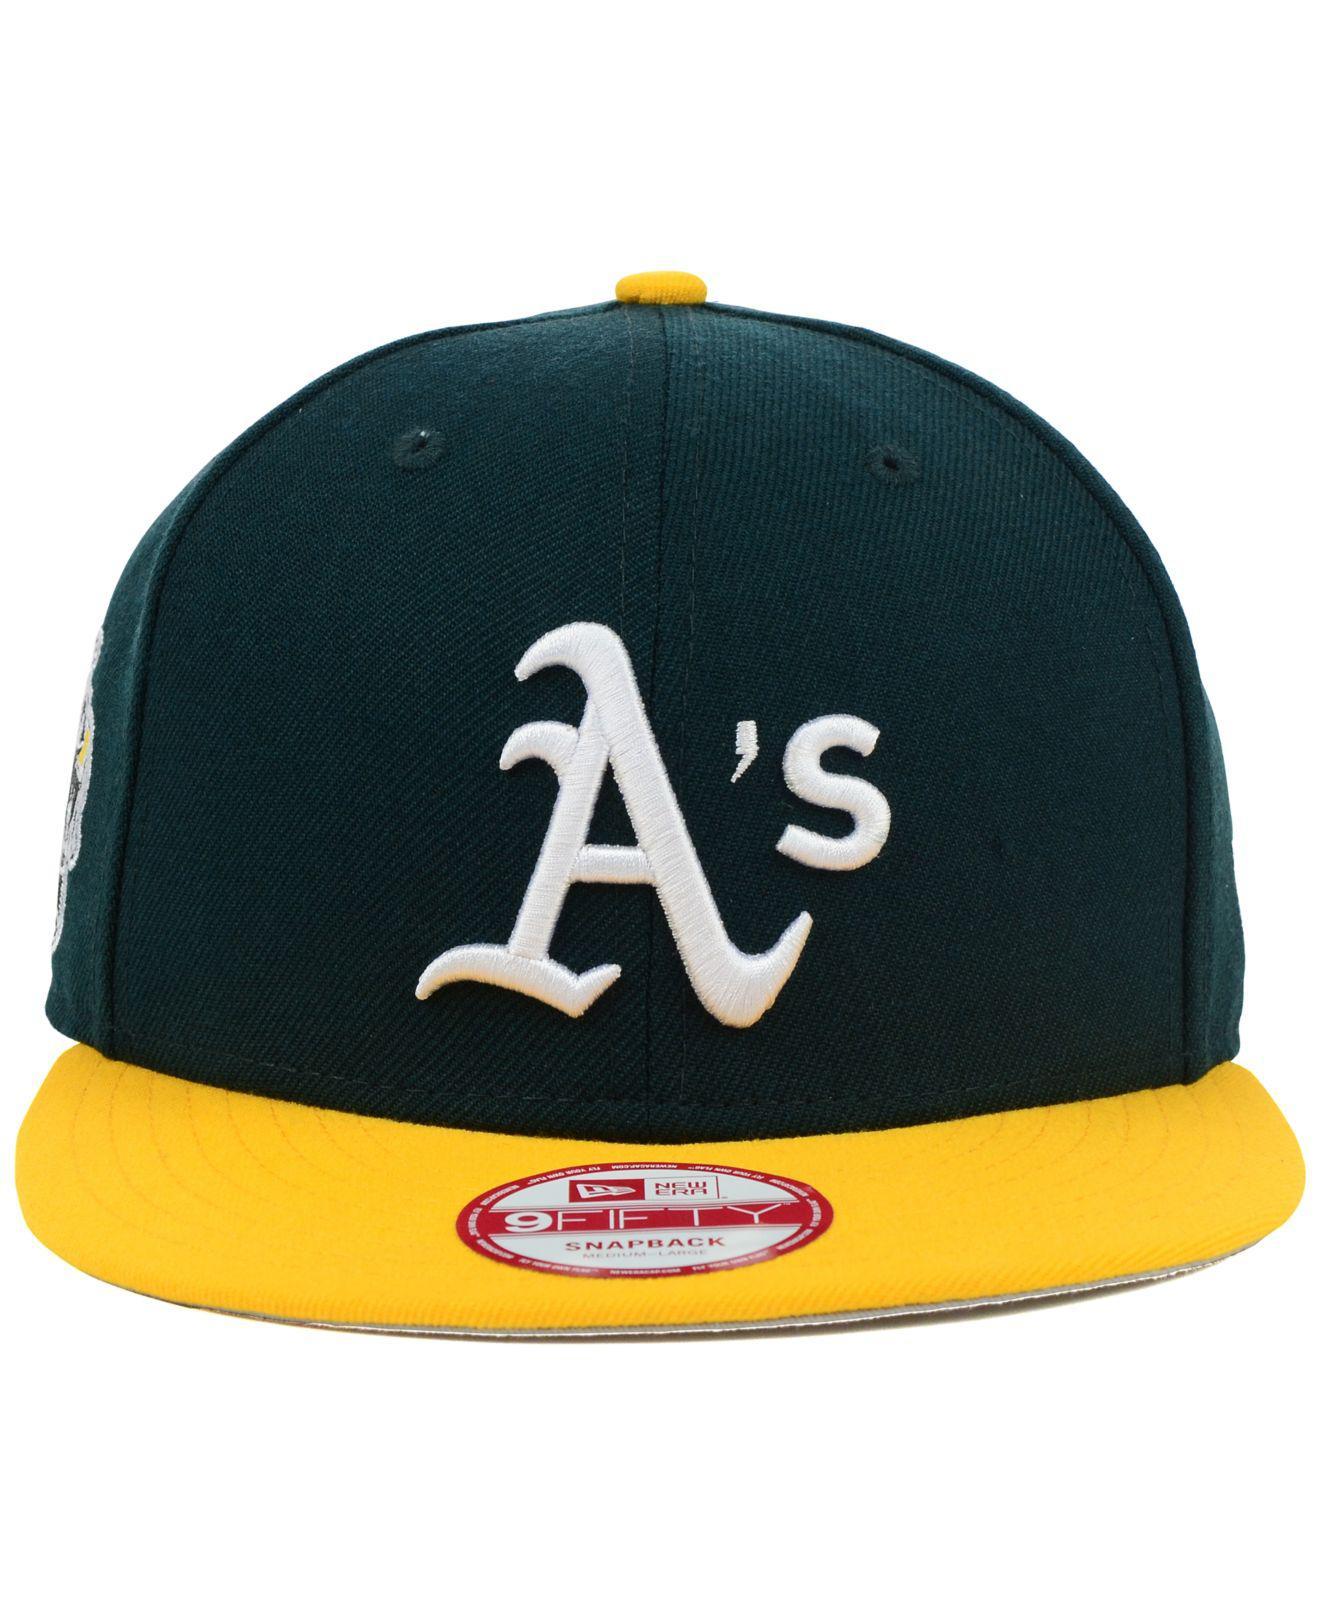 ee27c7b0ae2b27 ... Oakland Athletics Mlb 2 Tone Link 9fifty Snapback Cap for Men - Lyst.  View fullscreen